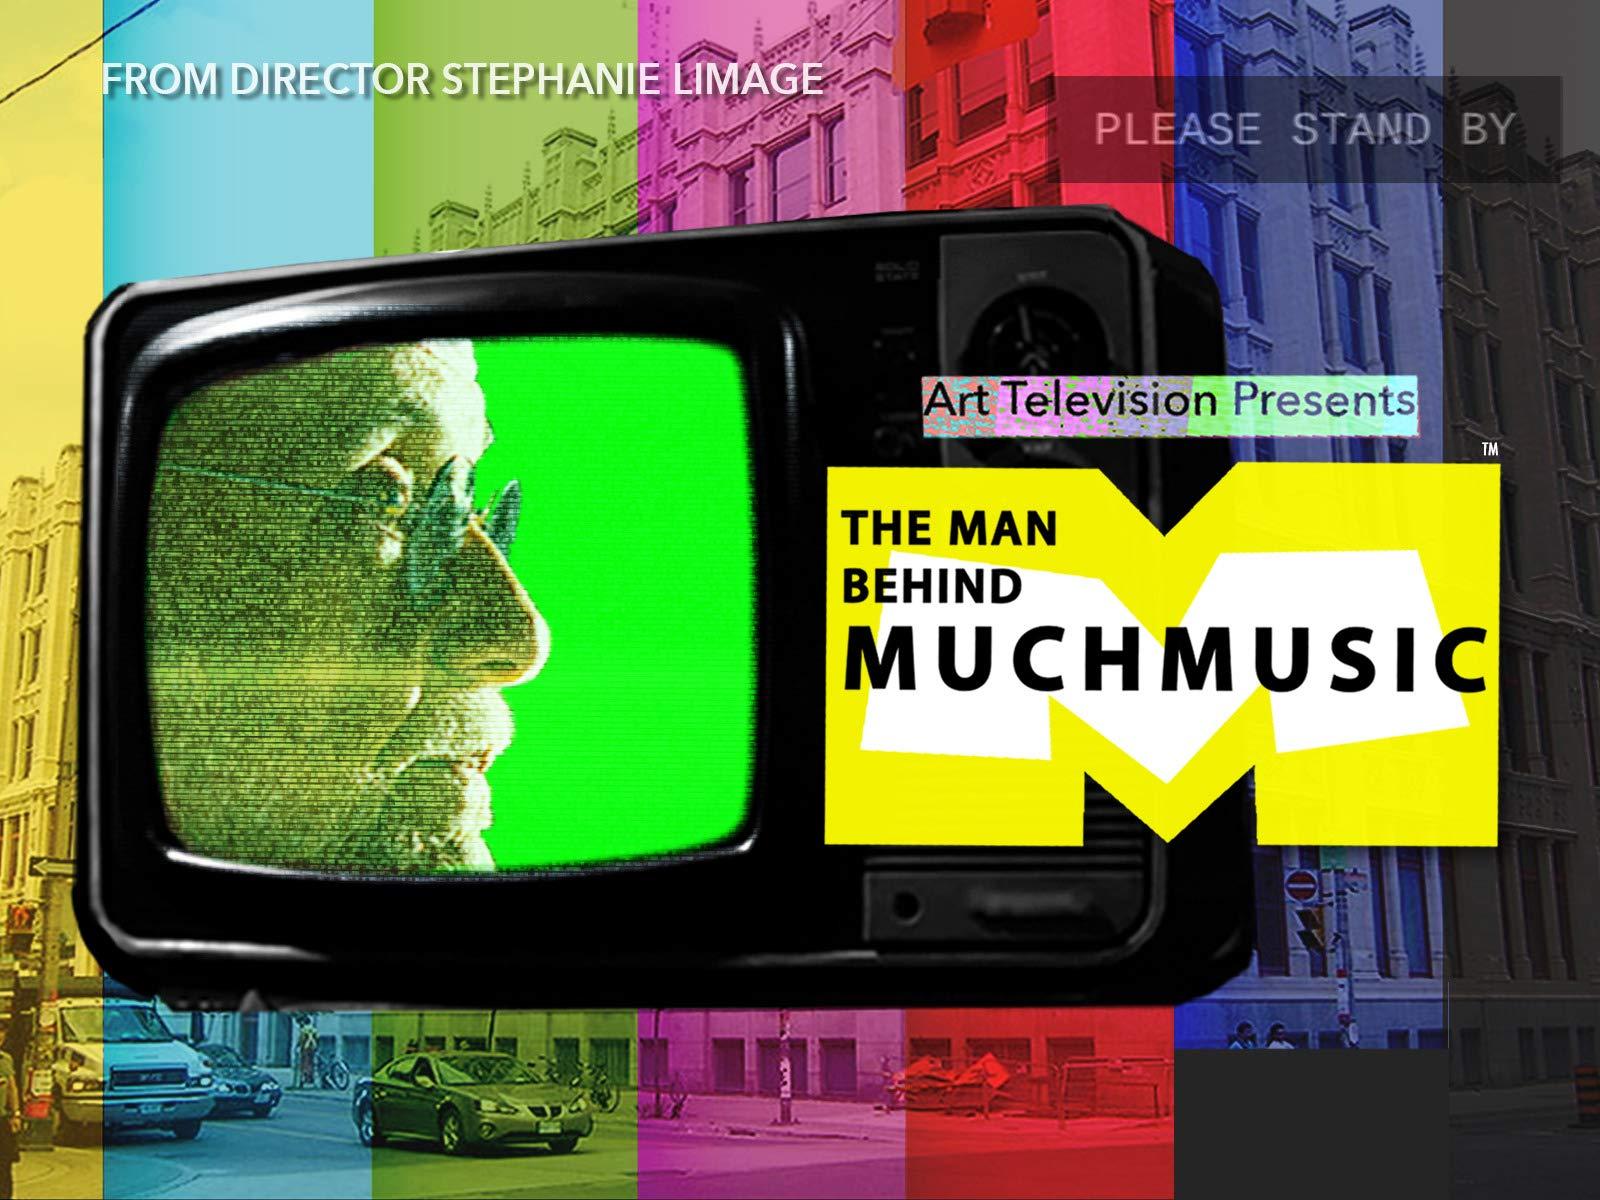 The Man Behind Much Music - Art Television - Season 1